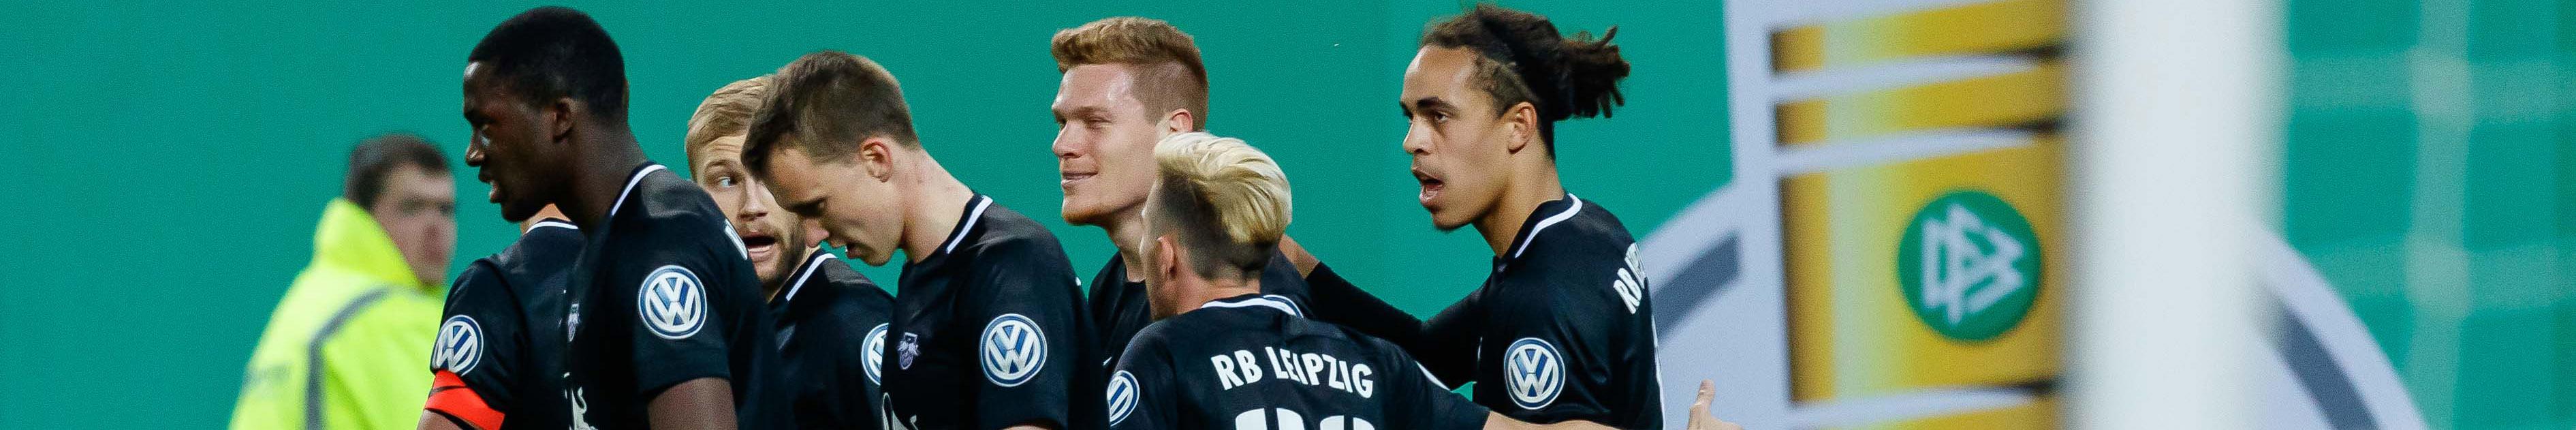 RB Leipzig: Kein normaler Neuling im DFB-Pokalfinale